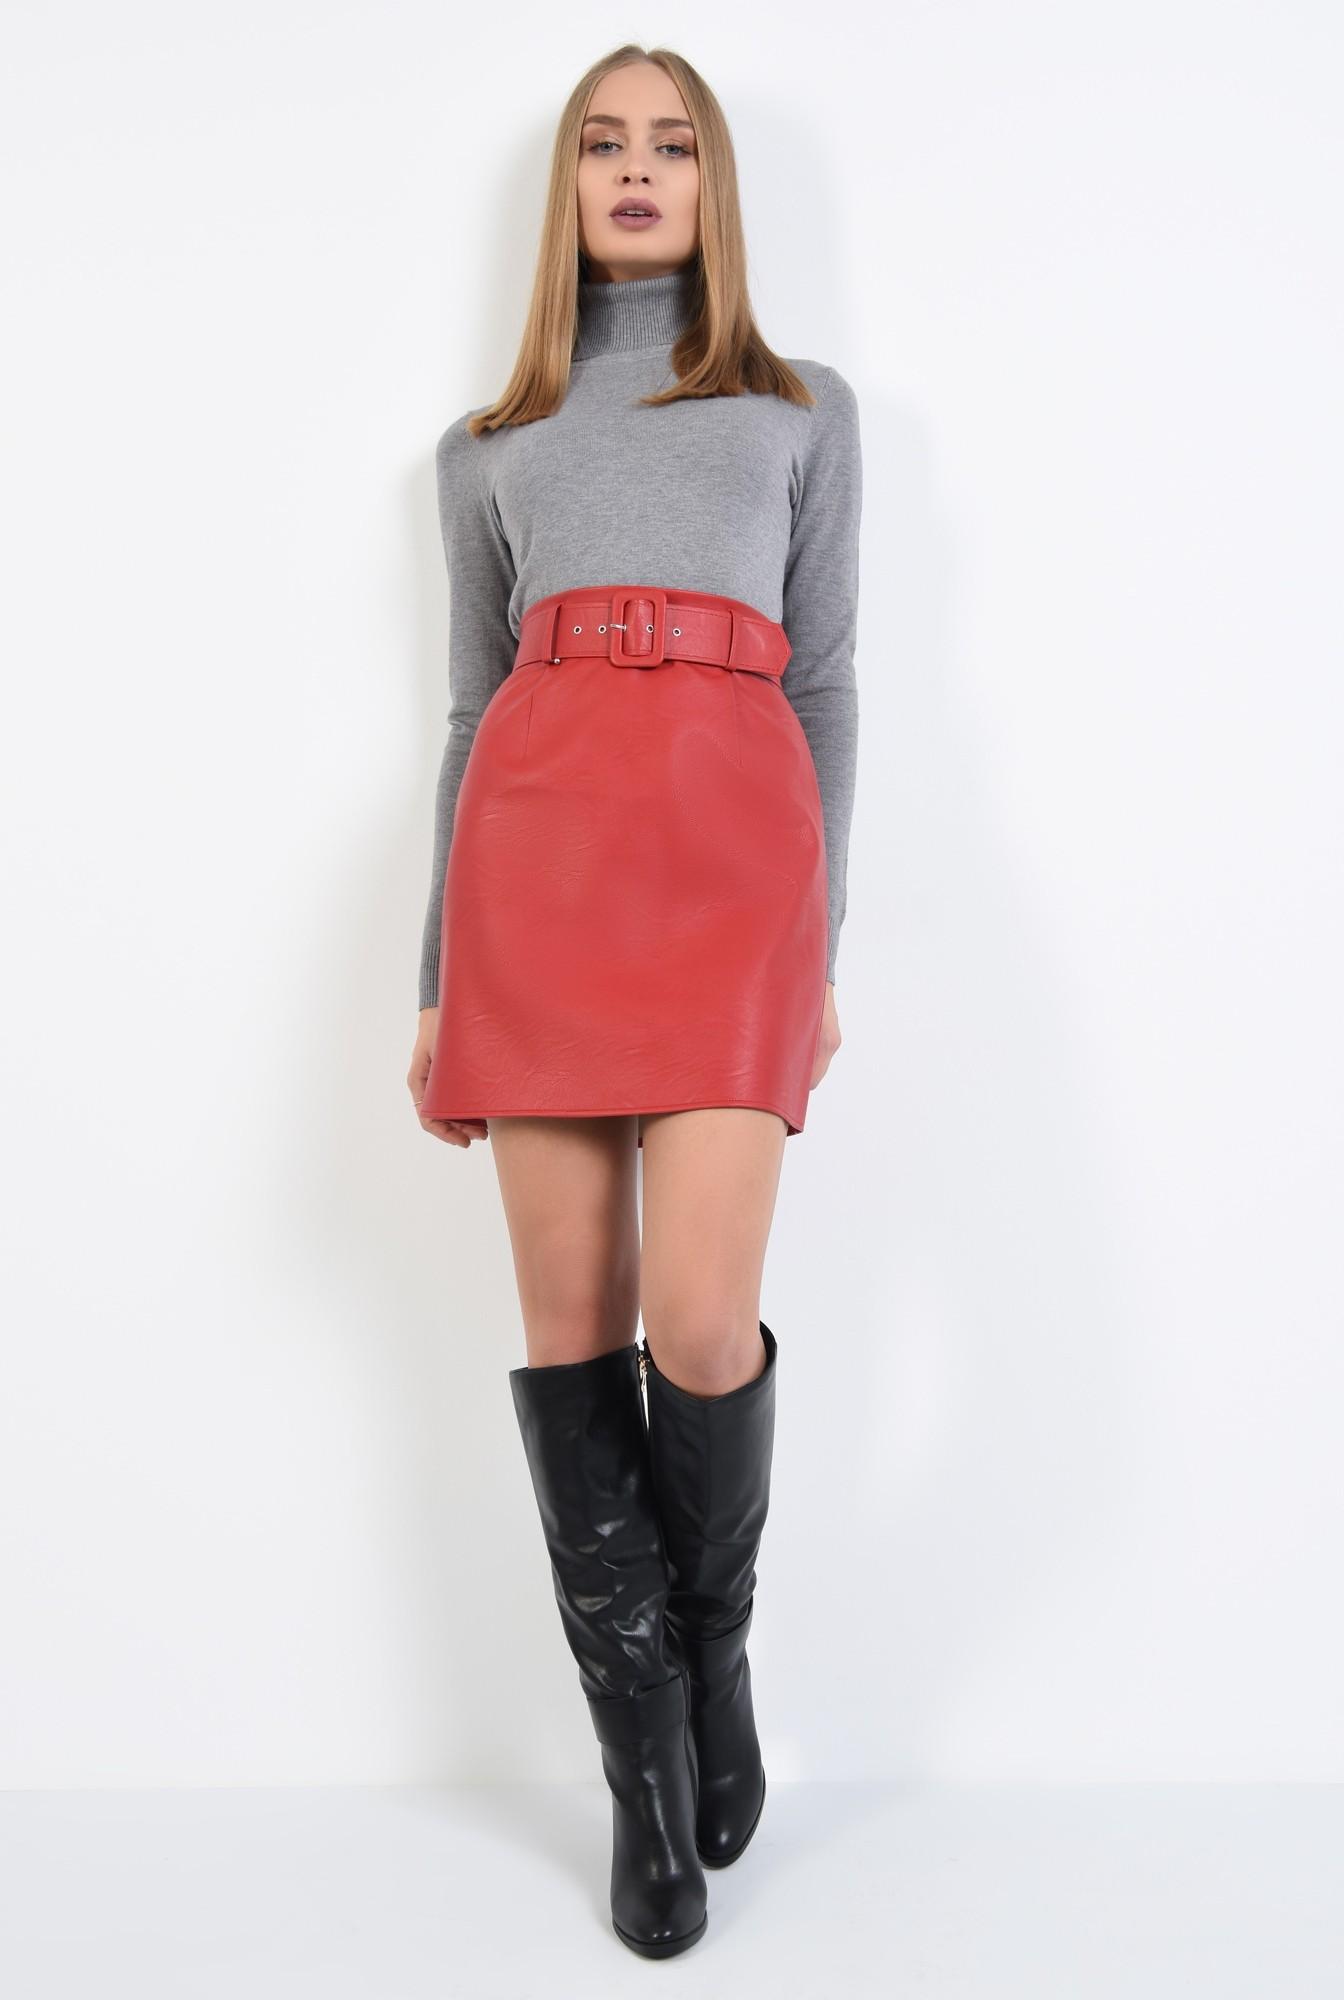 2 - pulover tip maleta, gri, borduri reiate, guler inalt, bluza tricotata